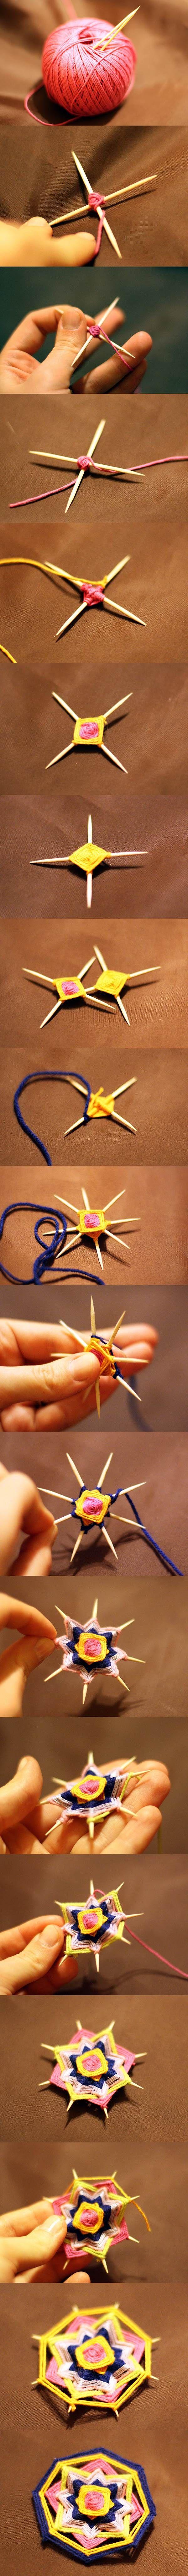 DIY Weave a Mandala Brooch with Toothpicks | iCreativeIdeas.com Like Us on Facebook ==> https://www.facebook.com/icreativeideas